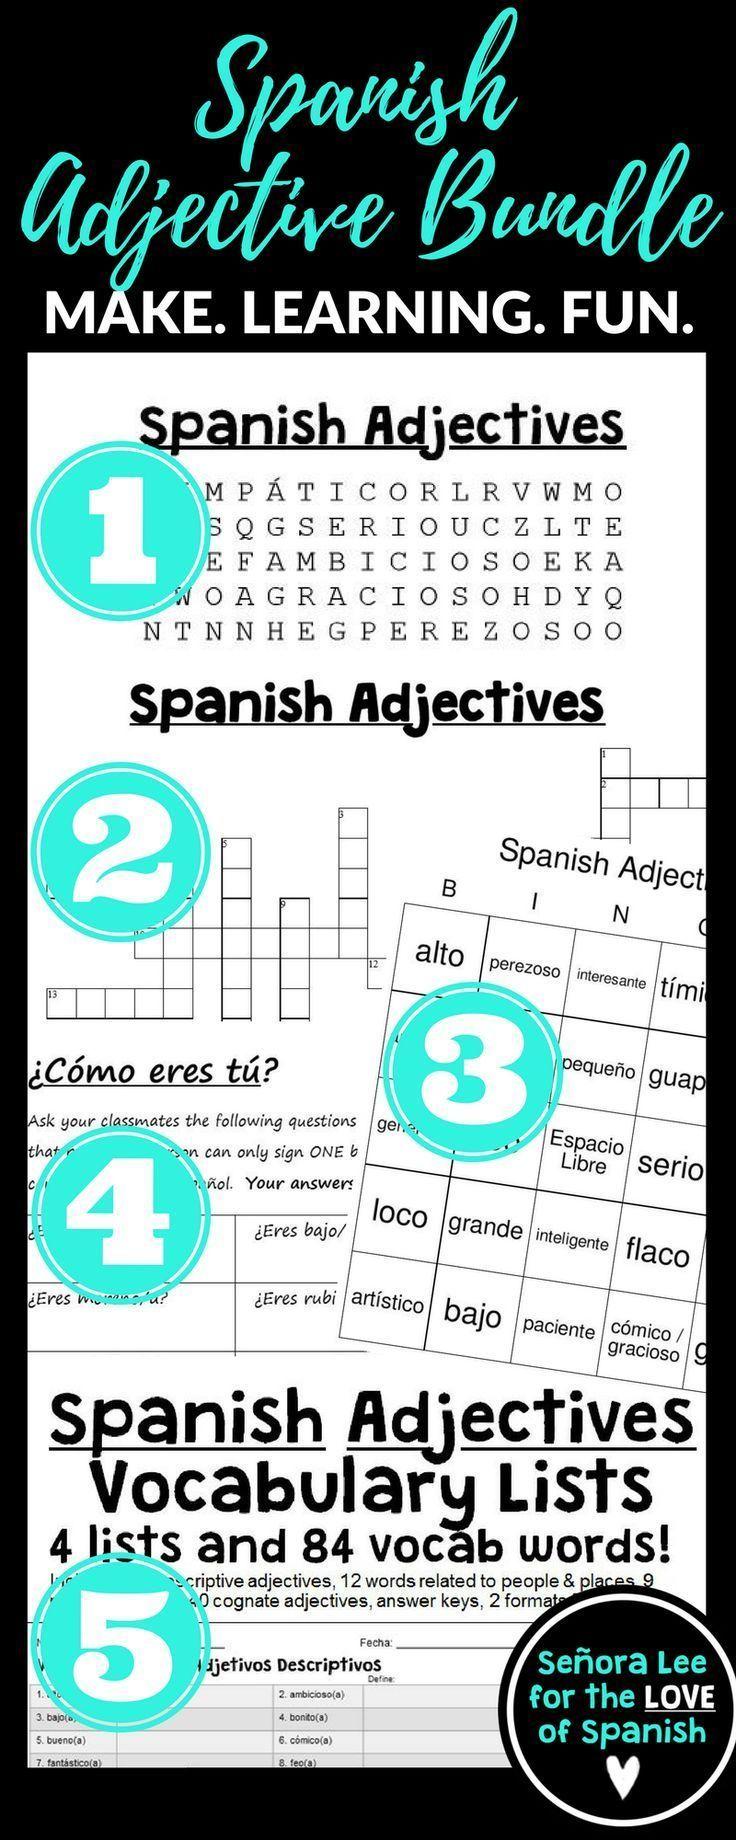 Adjectives: order - English Grammar Today - Cambridge ...